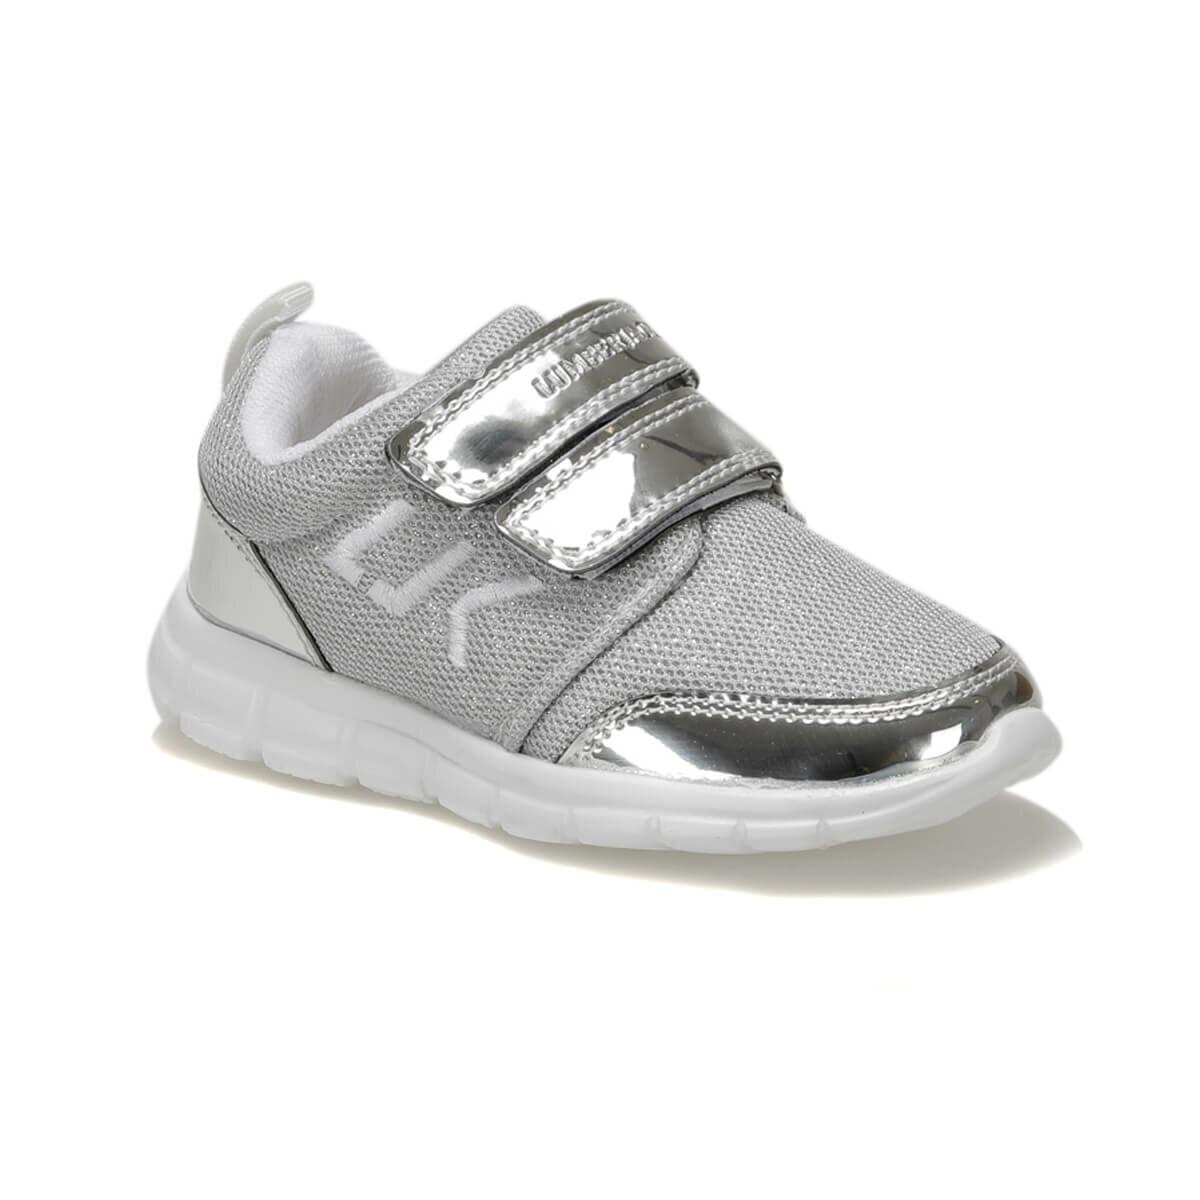 FLO SMASH Silver Female Child Sneaker Shoes LUMBERJACK